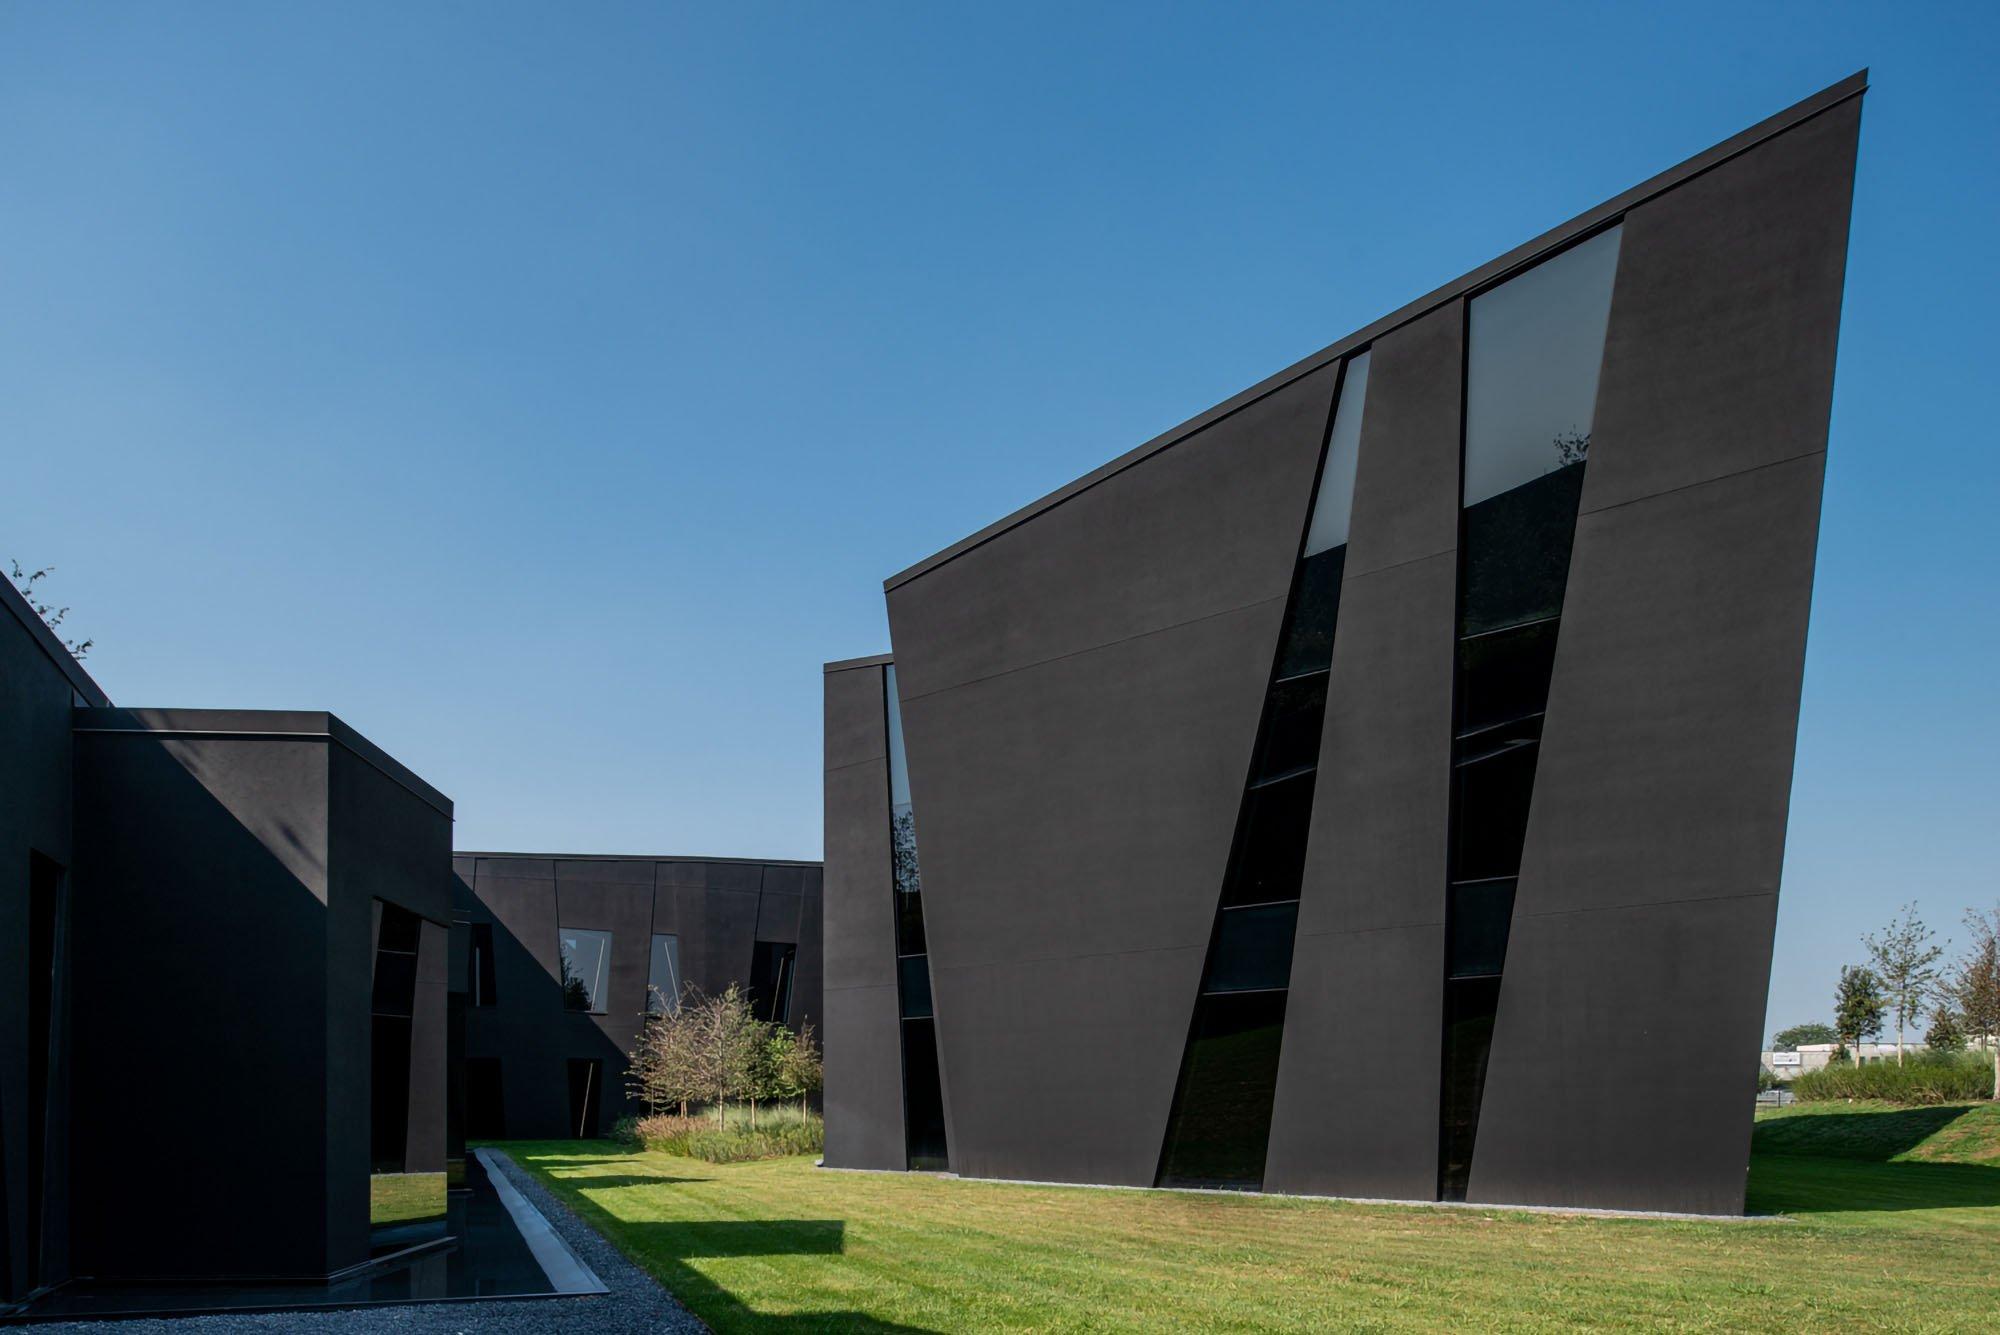 A striking black prism forms Chromavis's new headquarters